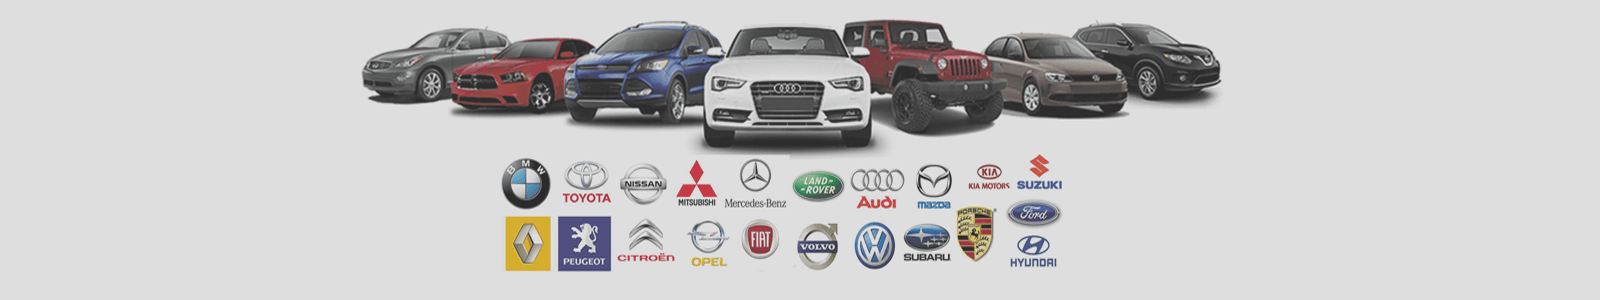 AutoAnkauf autoexport schweiz